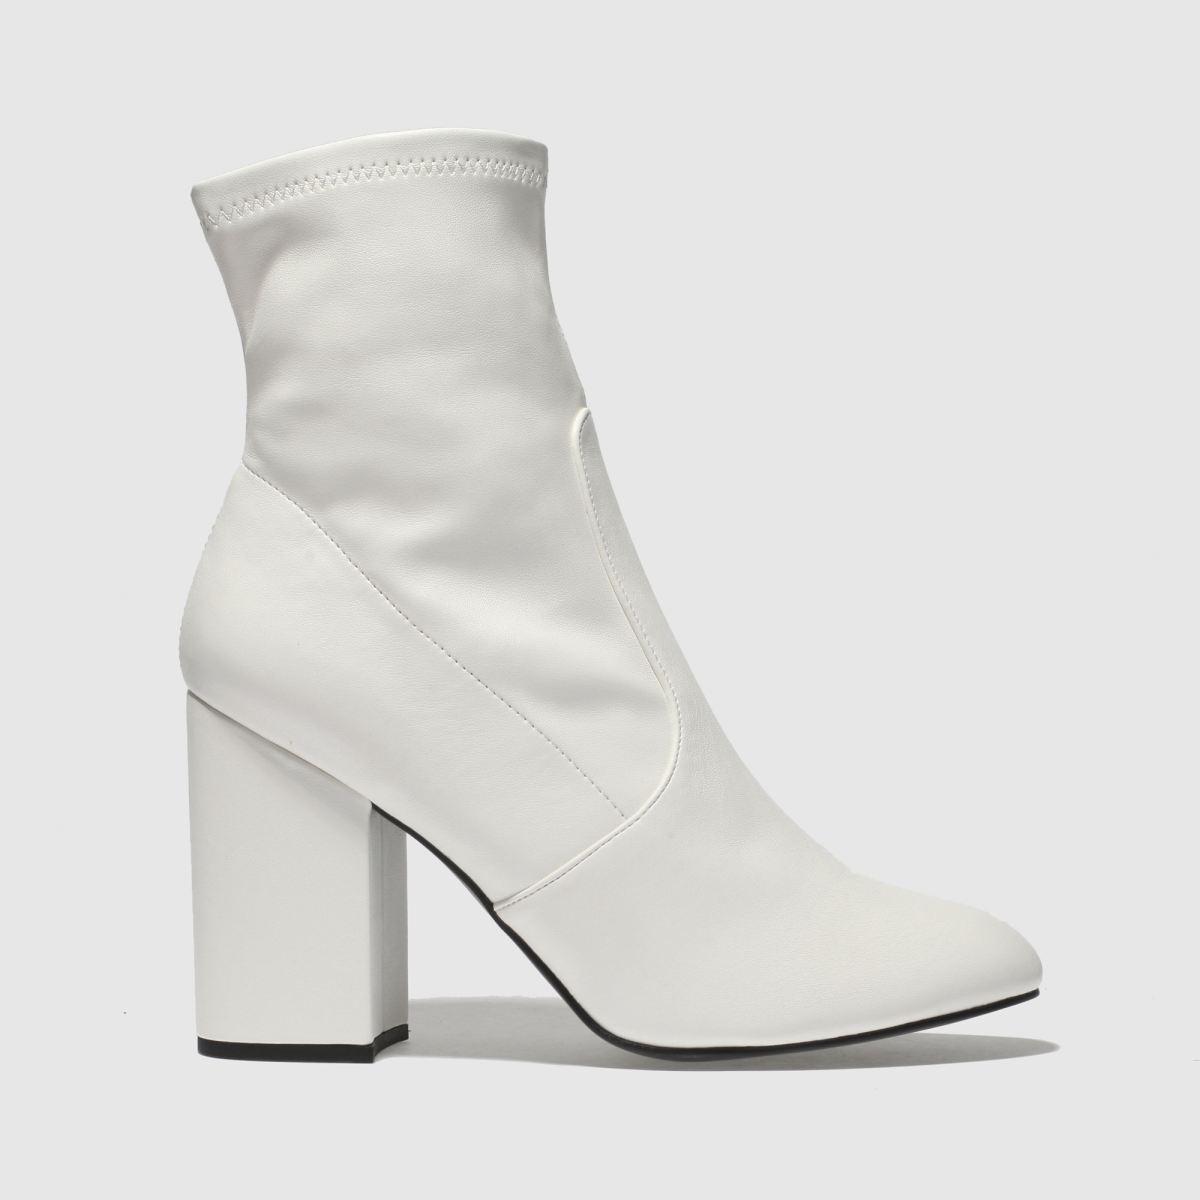 Schuh White Solo Boots